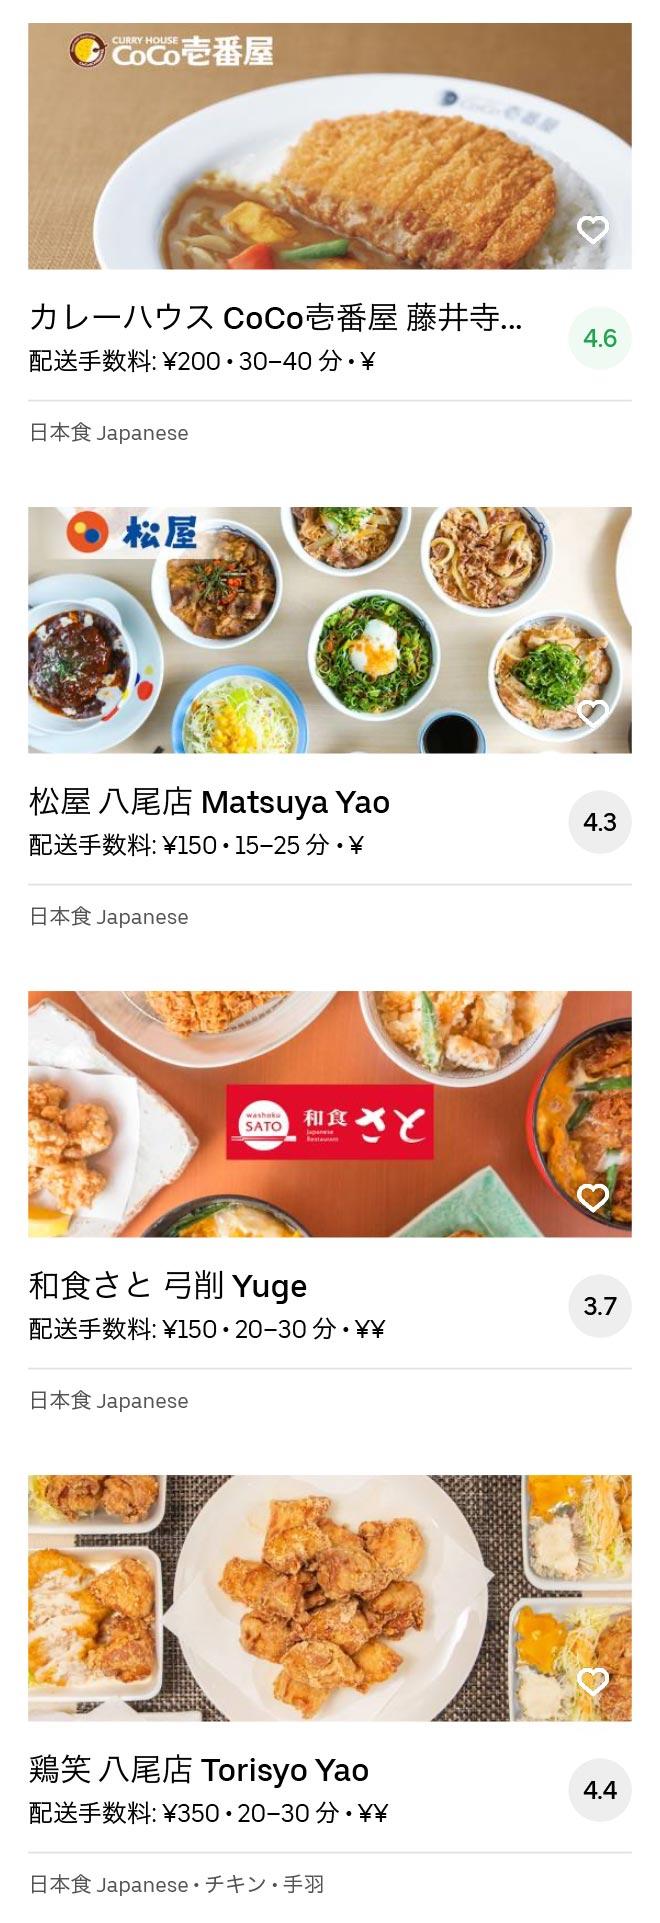 Kashiwara menu 2005 02